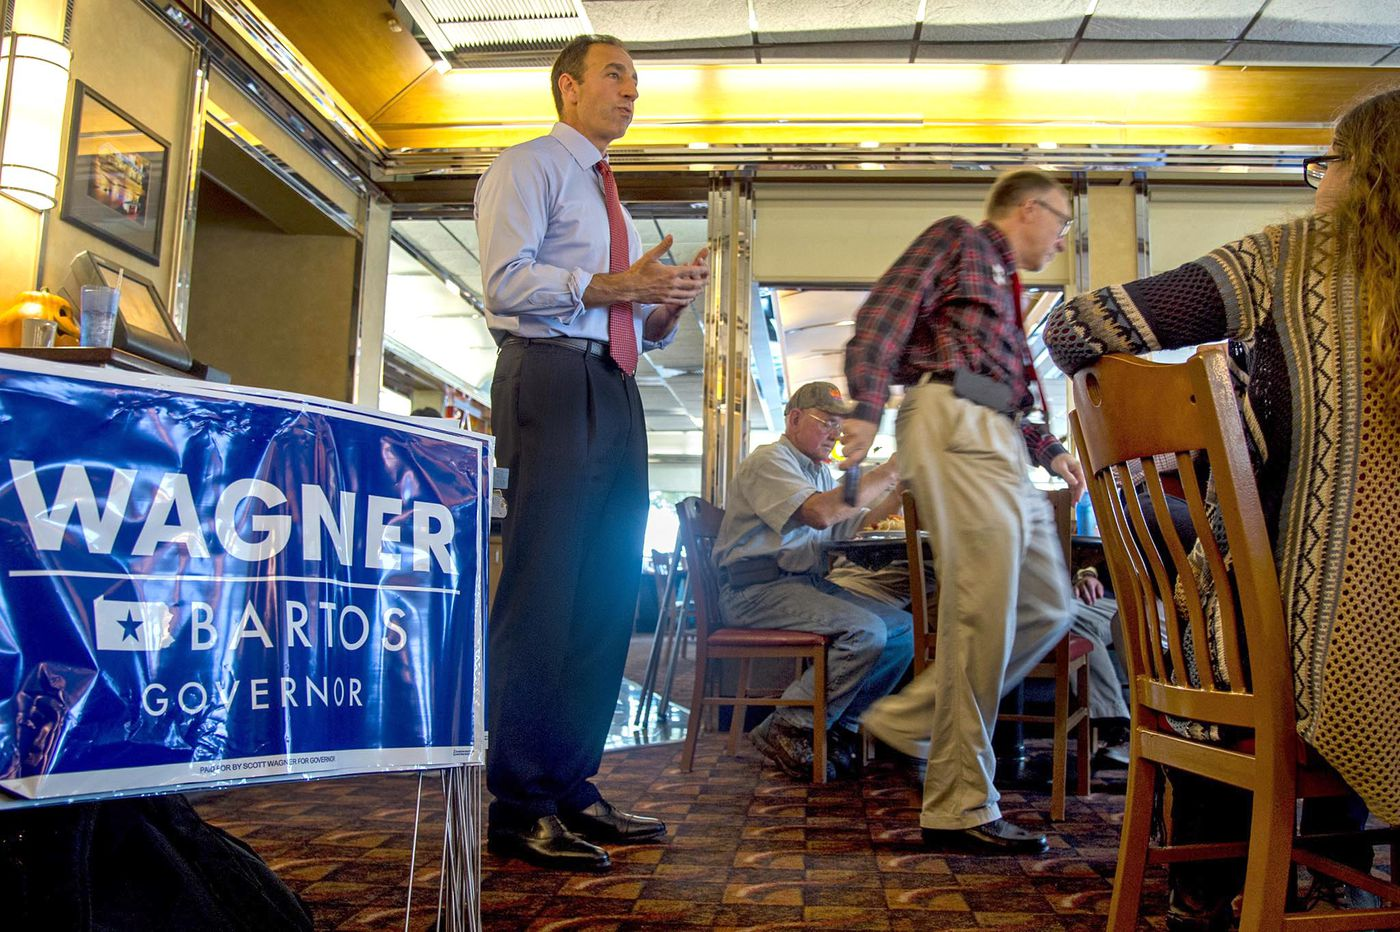 Photos of Republican Jeff Bartos campaigning for lieutenant governor